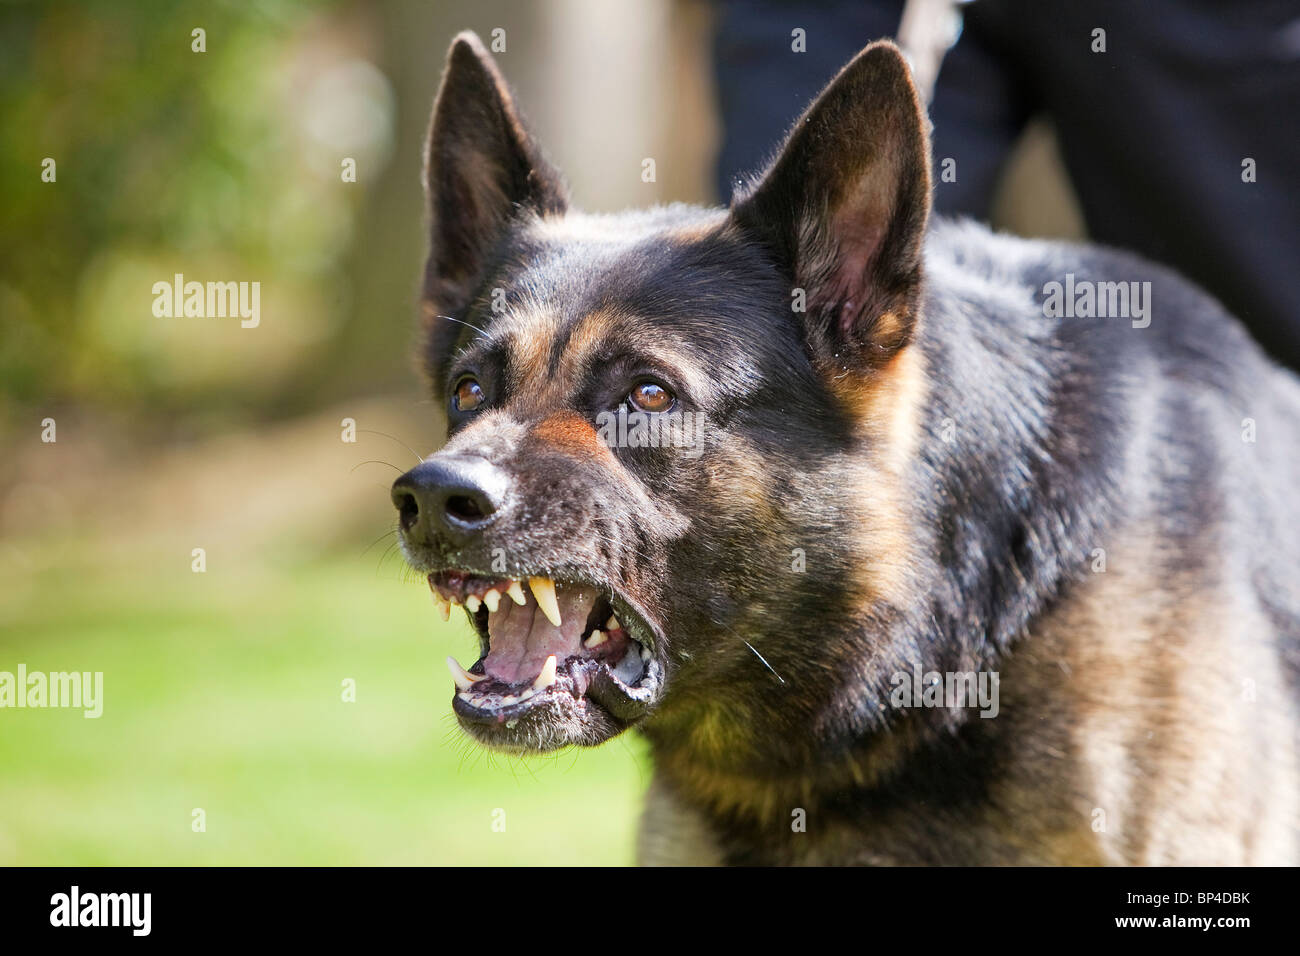 A former prison service German Shepherd working dog showing aggressive behaviour - Stock Image